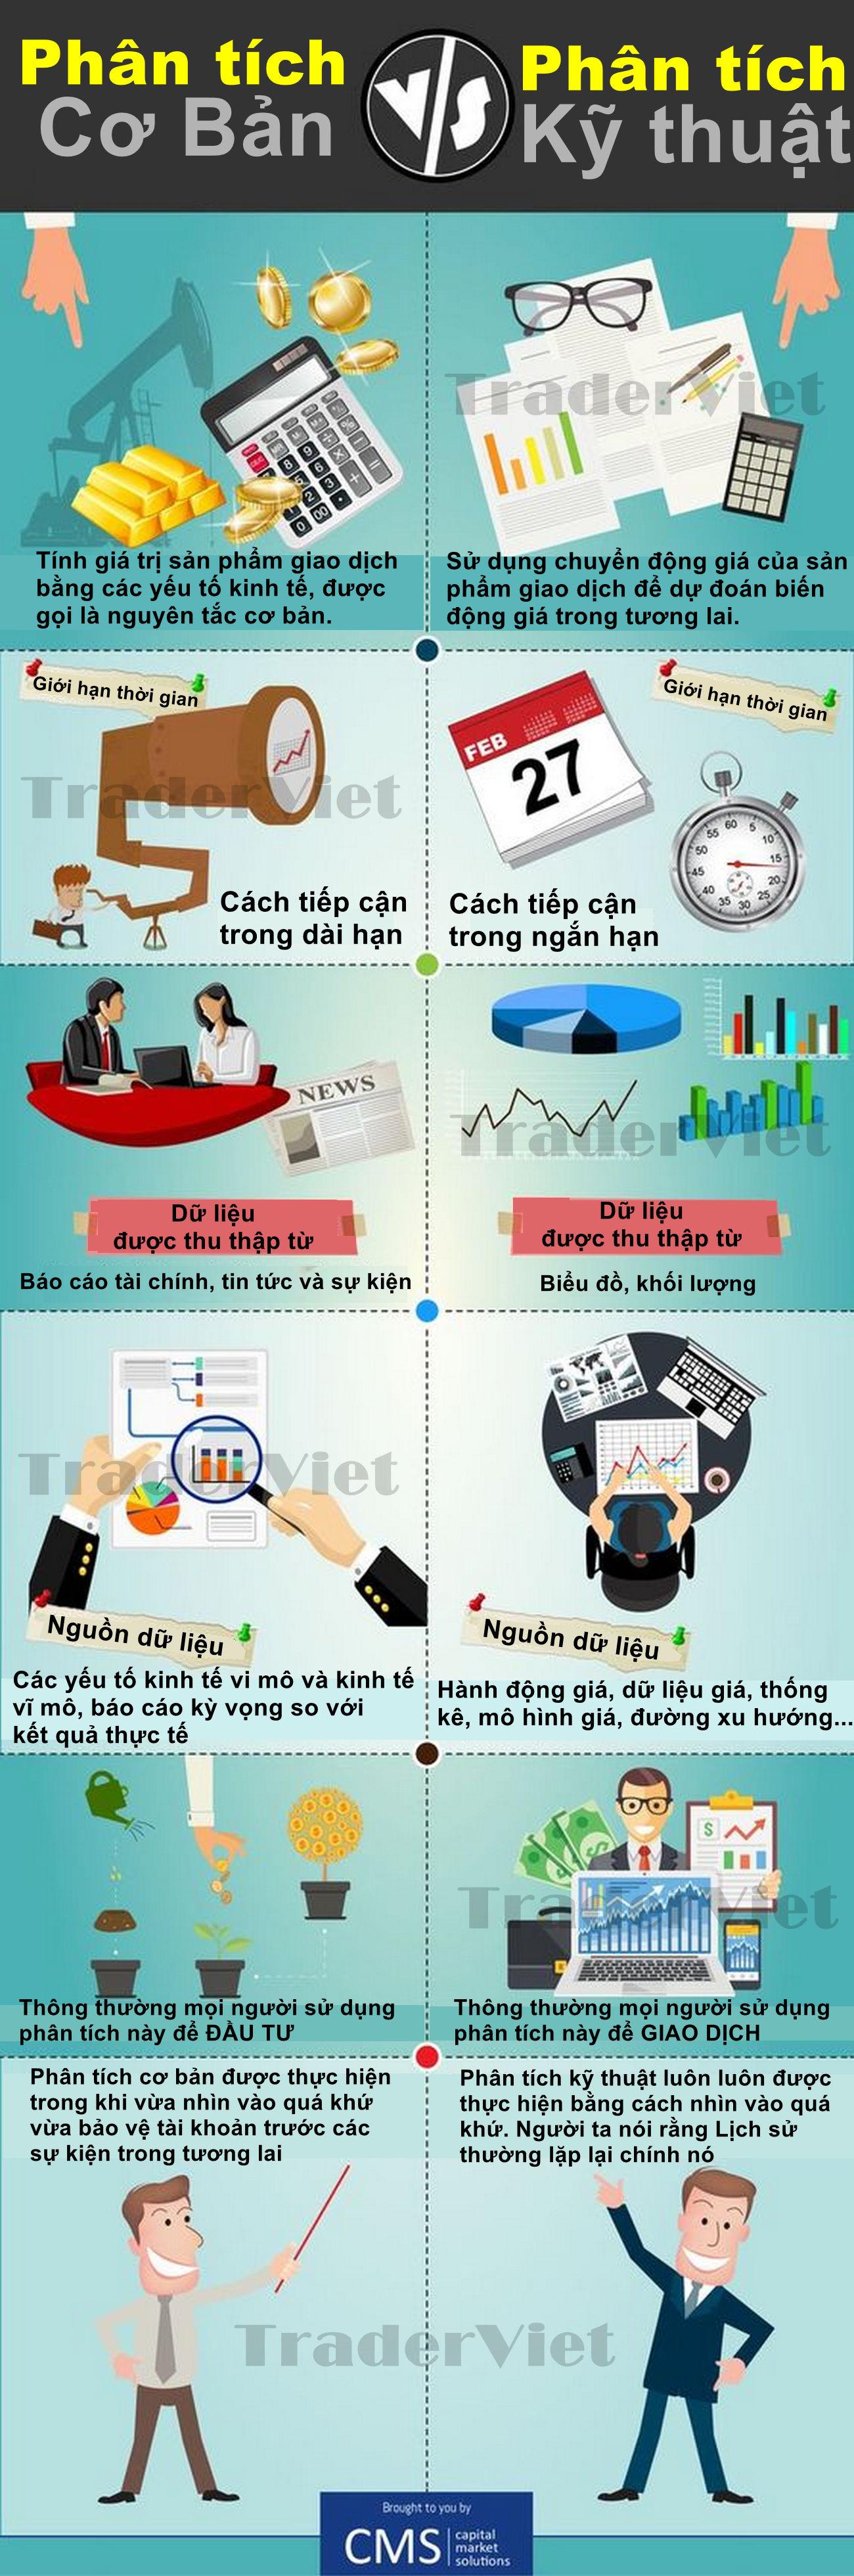 Infographic-Su-khac-nhau-giua-Phan-tich-co-ban-va-Phan-tich-ky-thuat-TraderViet1.